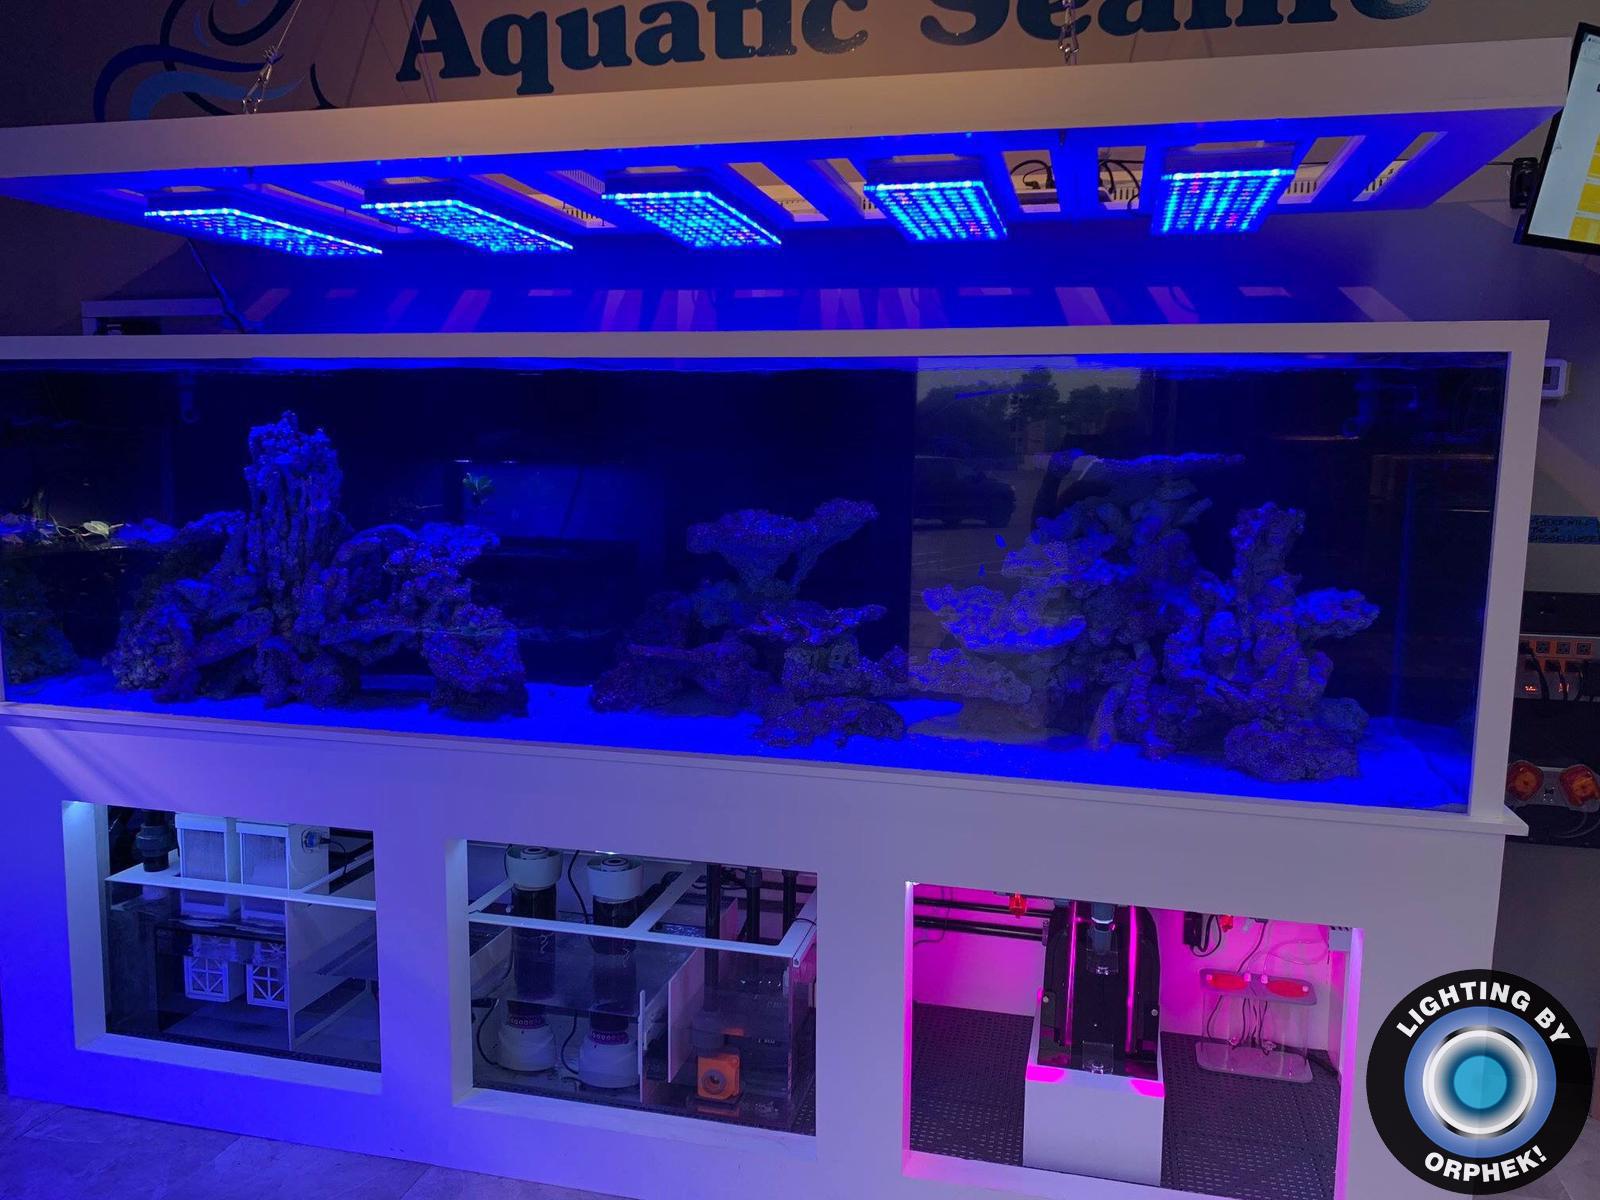 tangki terumbu besar yang terbaik LED lampu 2020